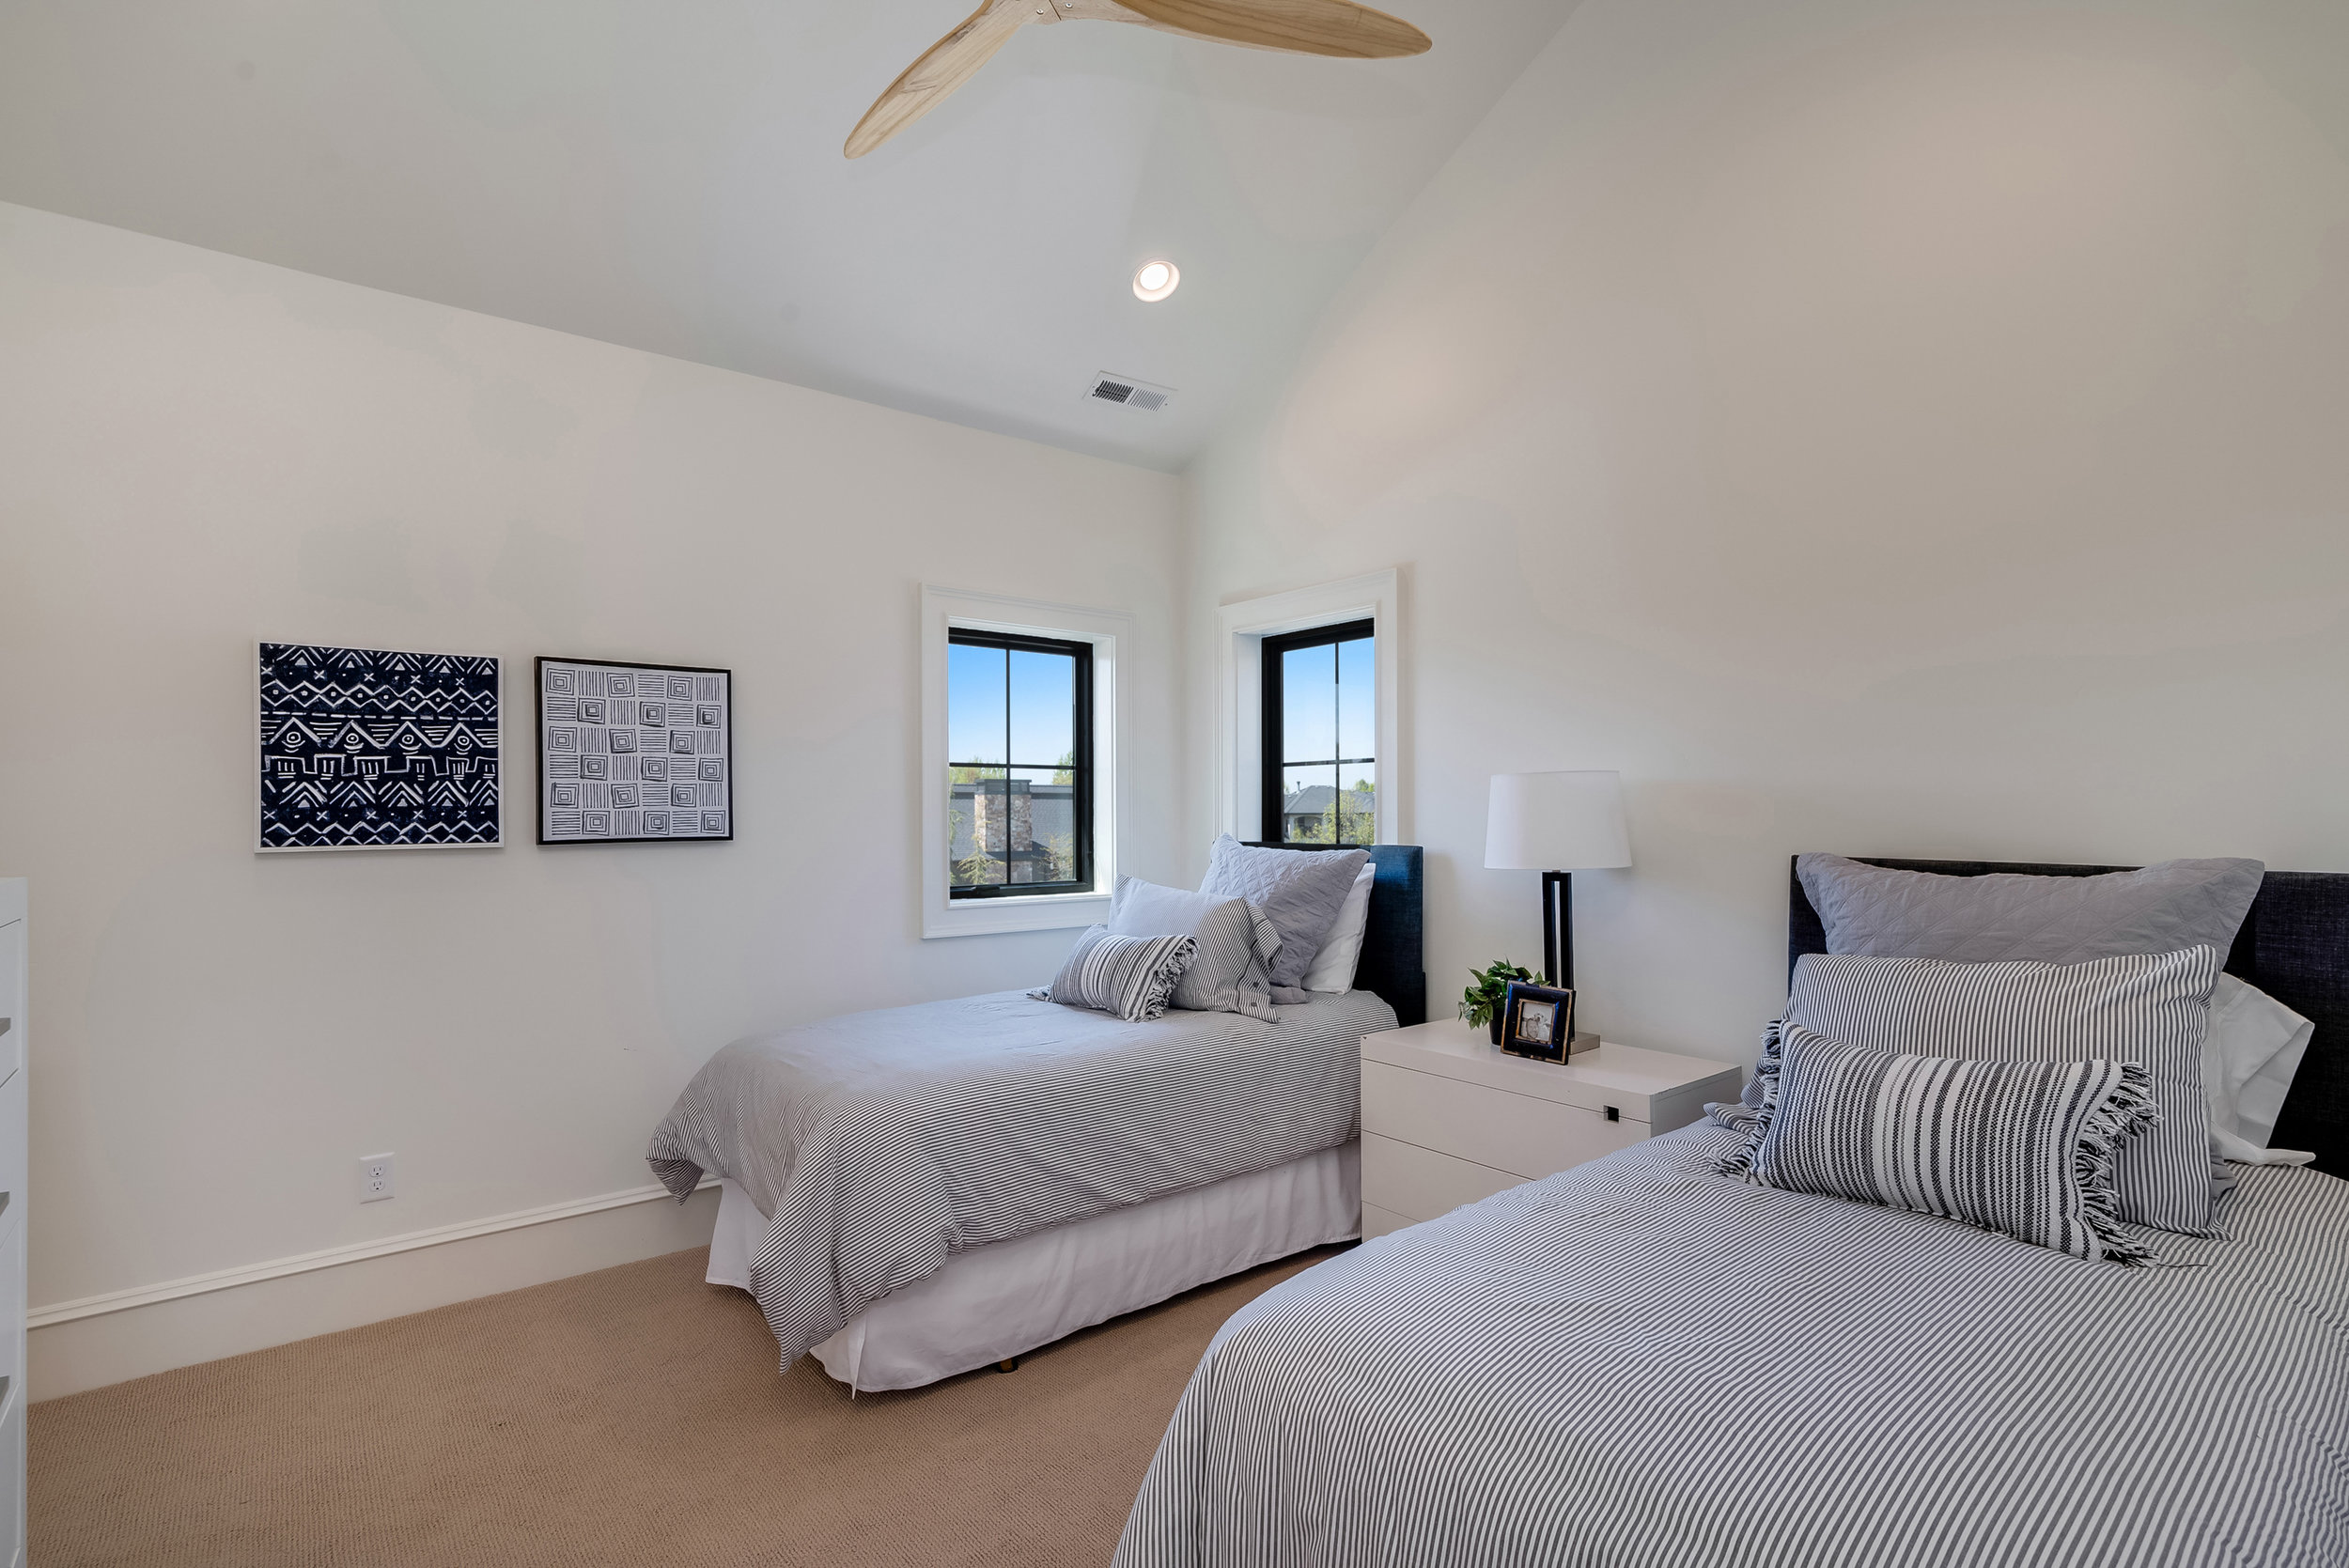 24-Bedroom.jpg